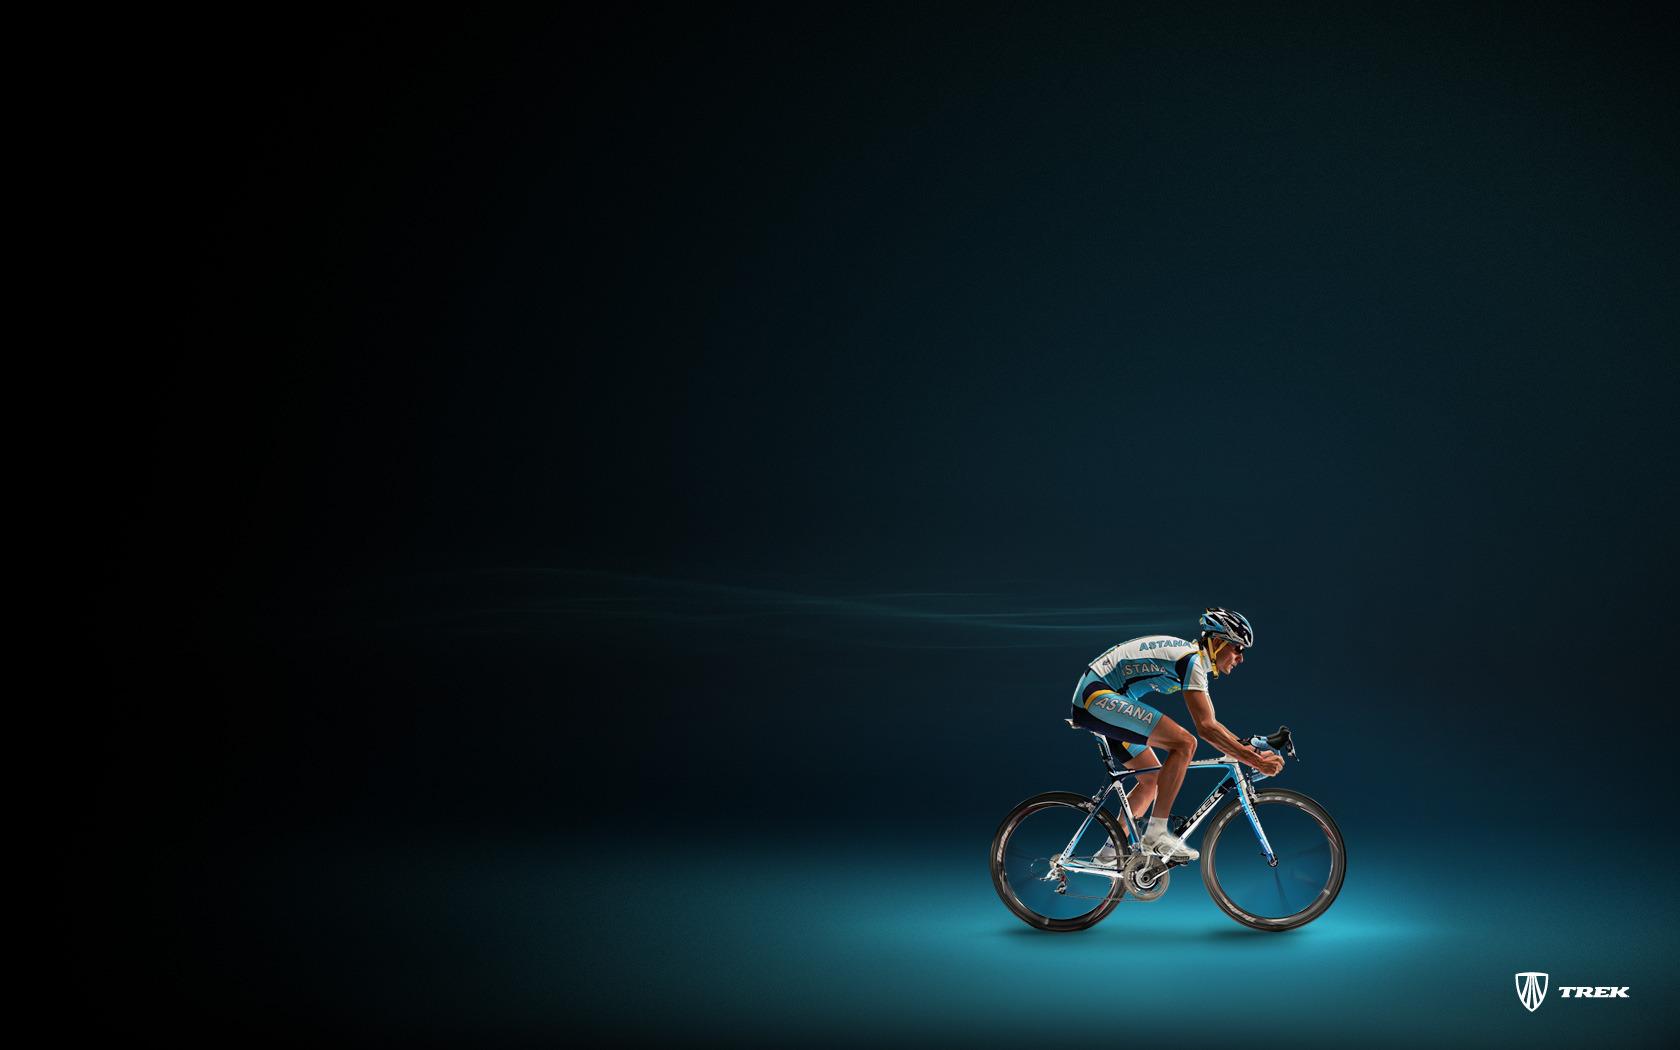 спорт велосипед споротсмен мужчина  № 1633579 загрузить